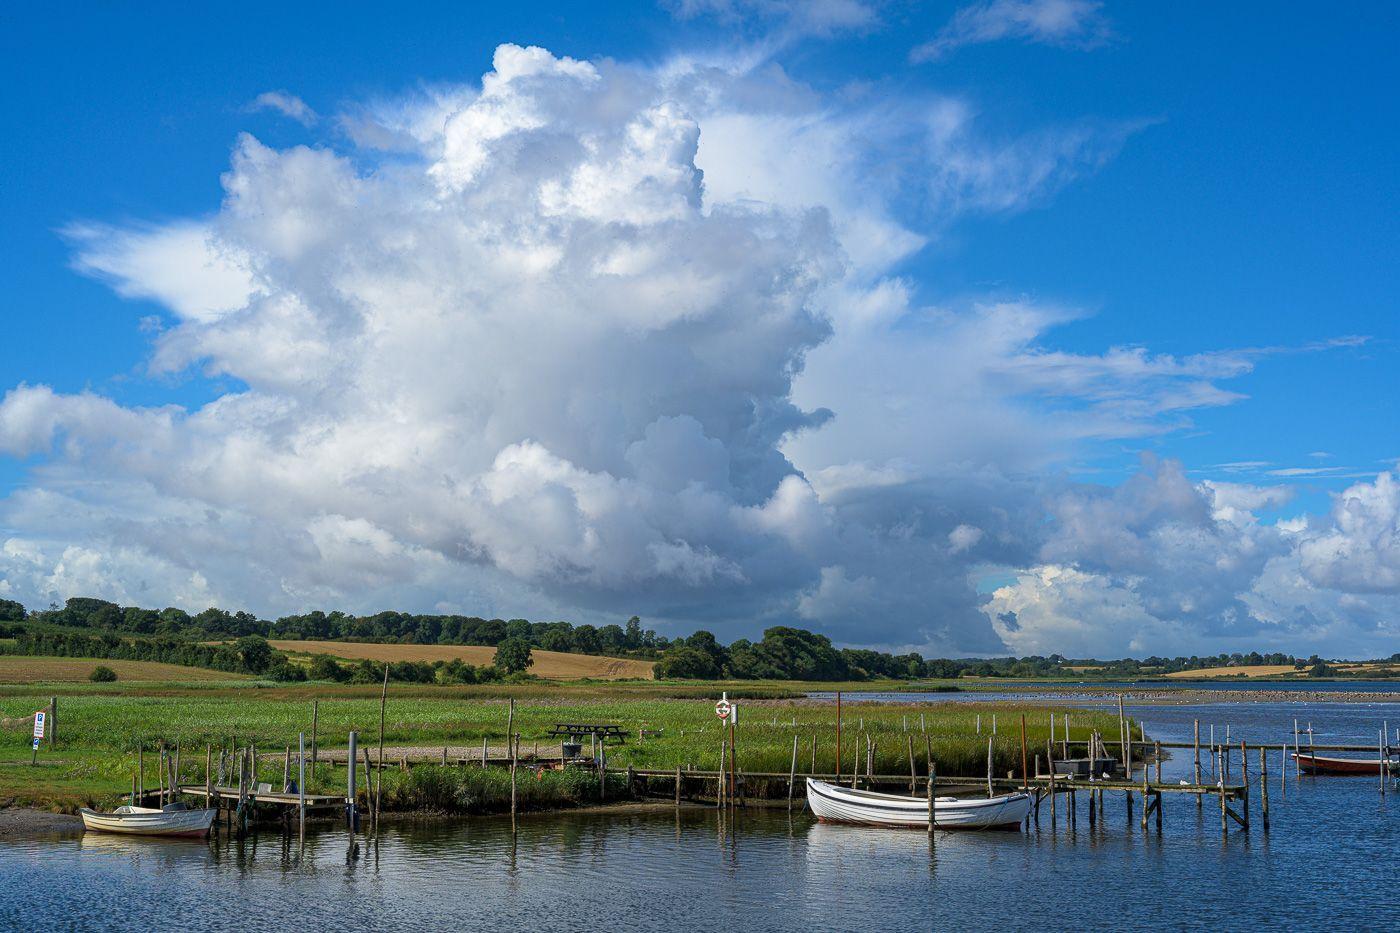 Jahresrückblick 2020 - August - Blick auf Hejls Nor in Hejlsminde, Dänemark